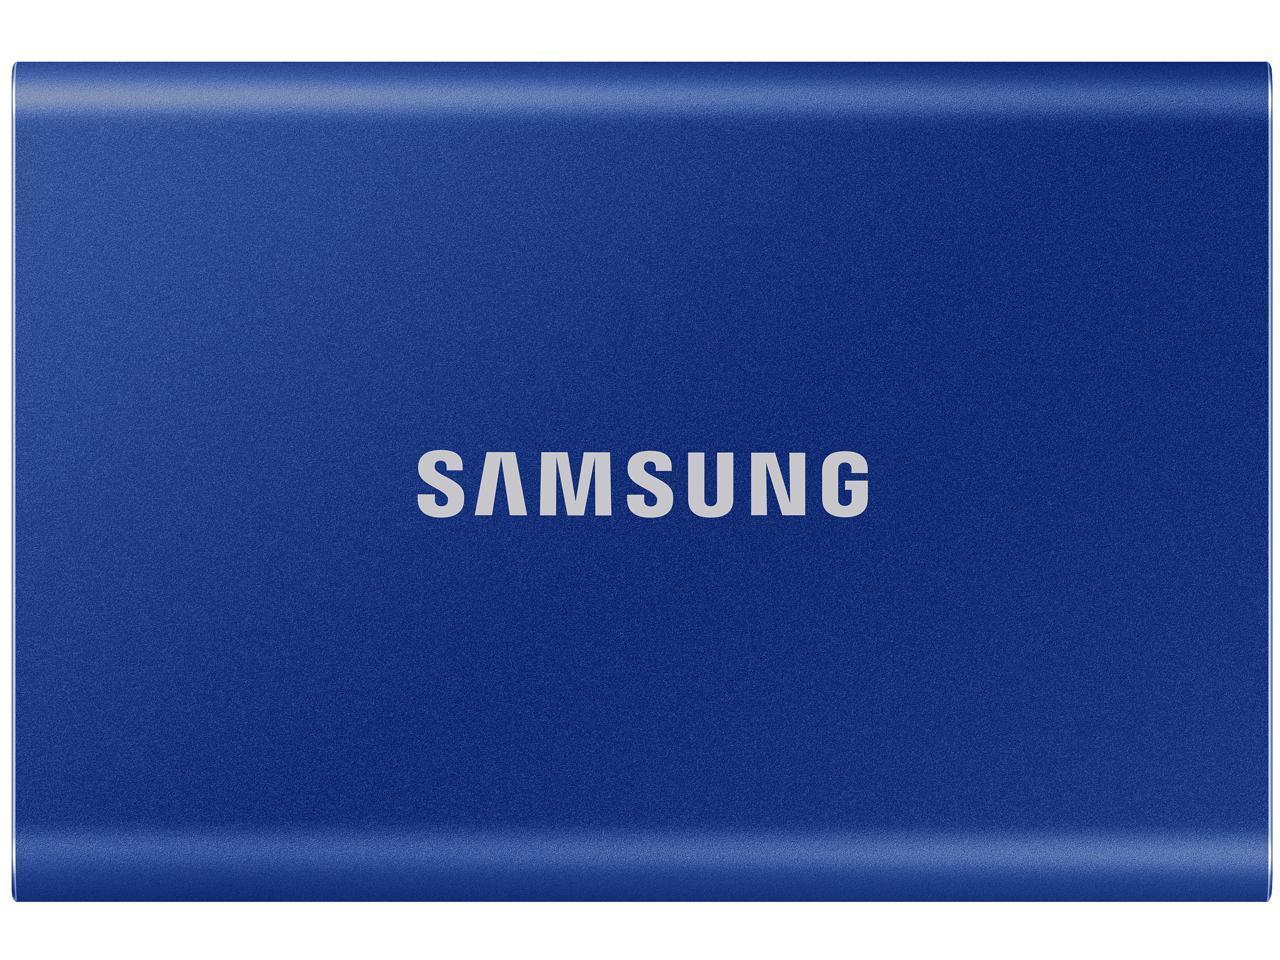 500GB SAMSUNG T7 Portable SSD @Newegg $59.49